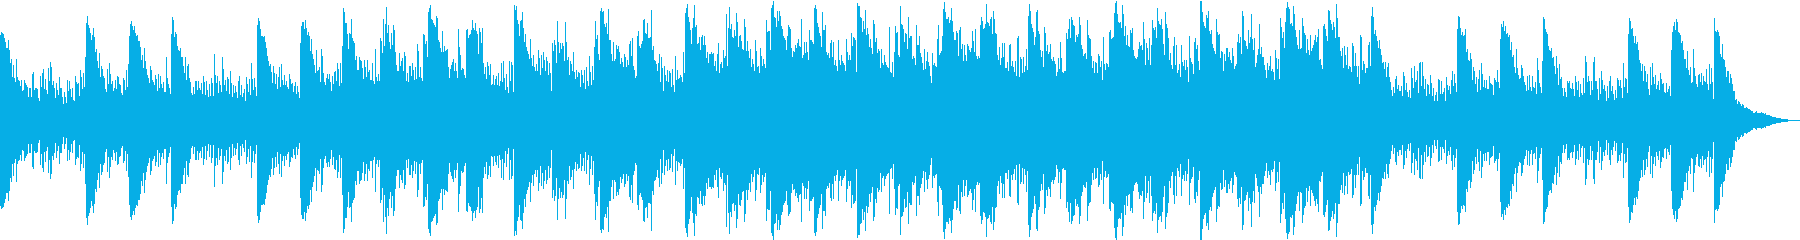 Messageの再生済みの波形